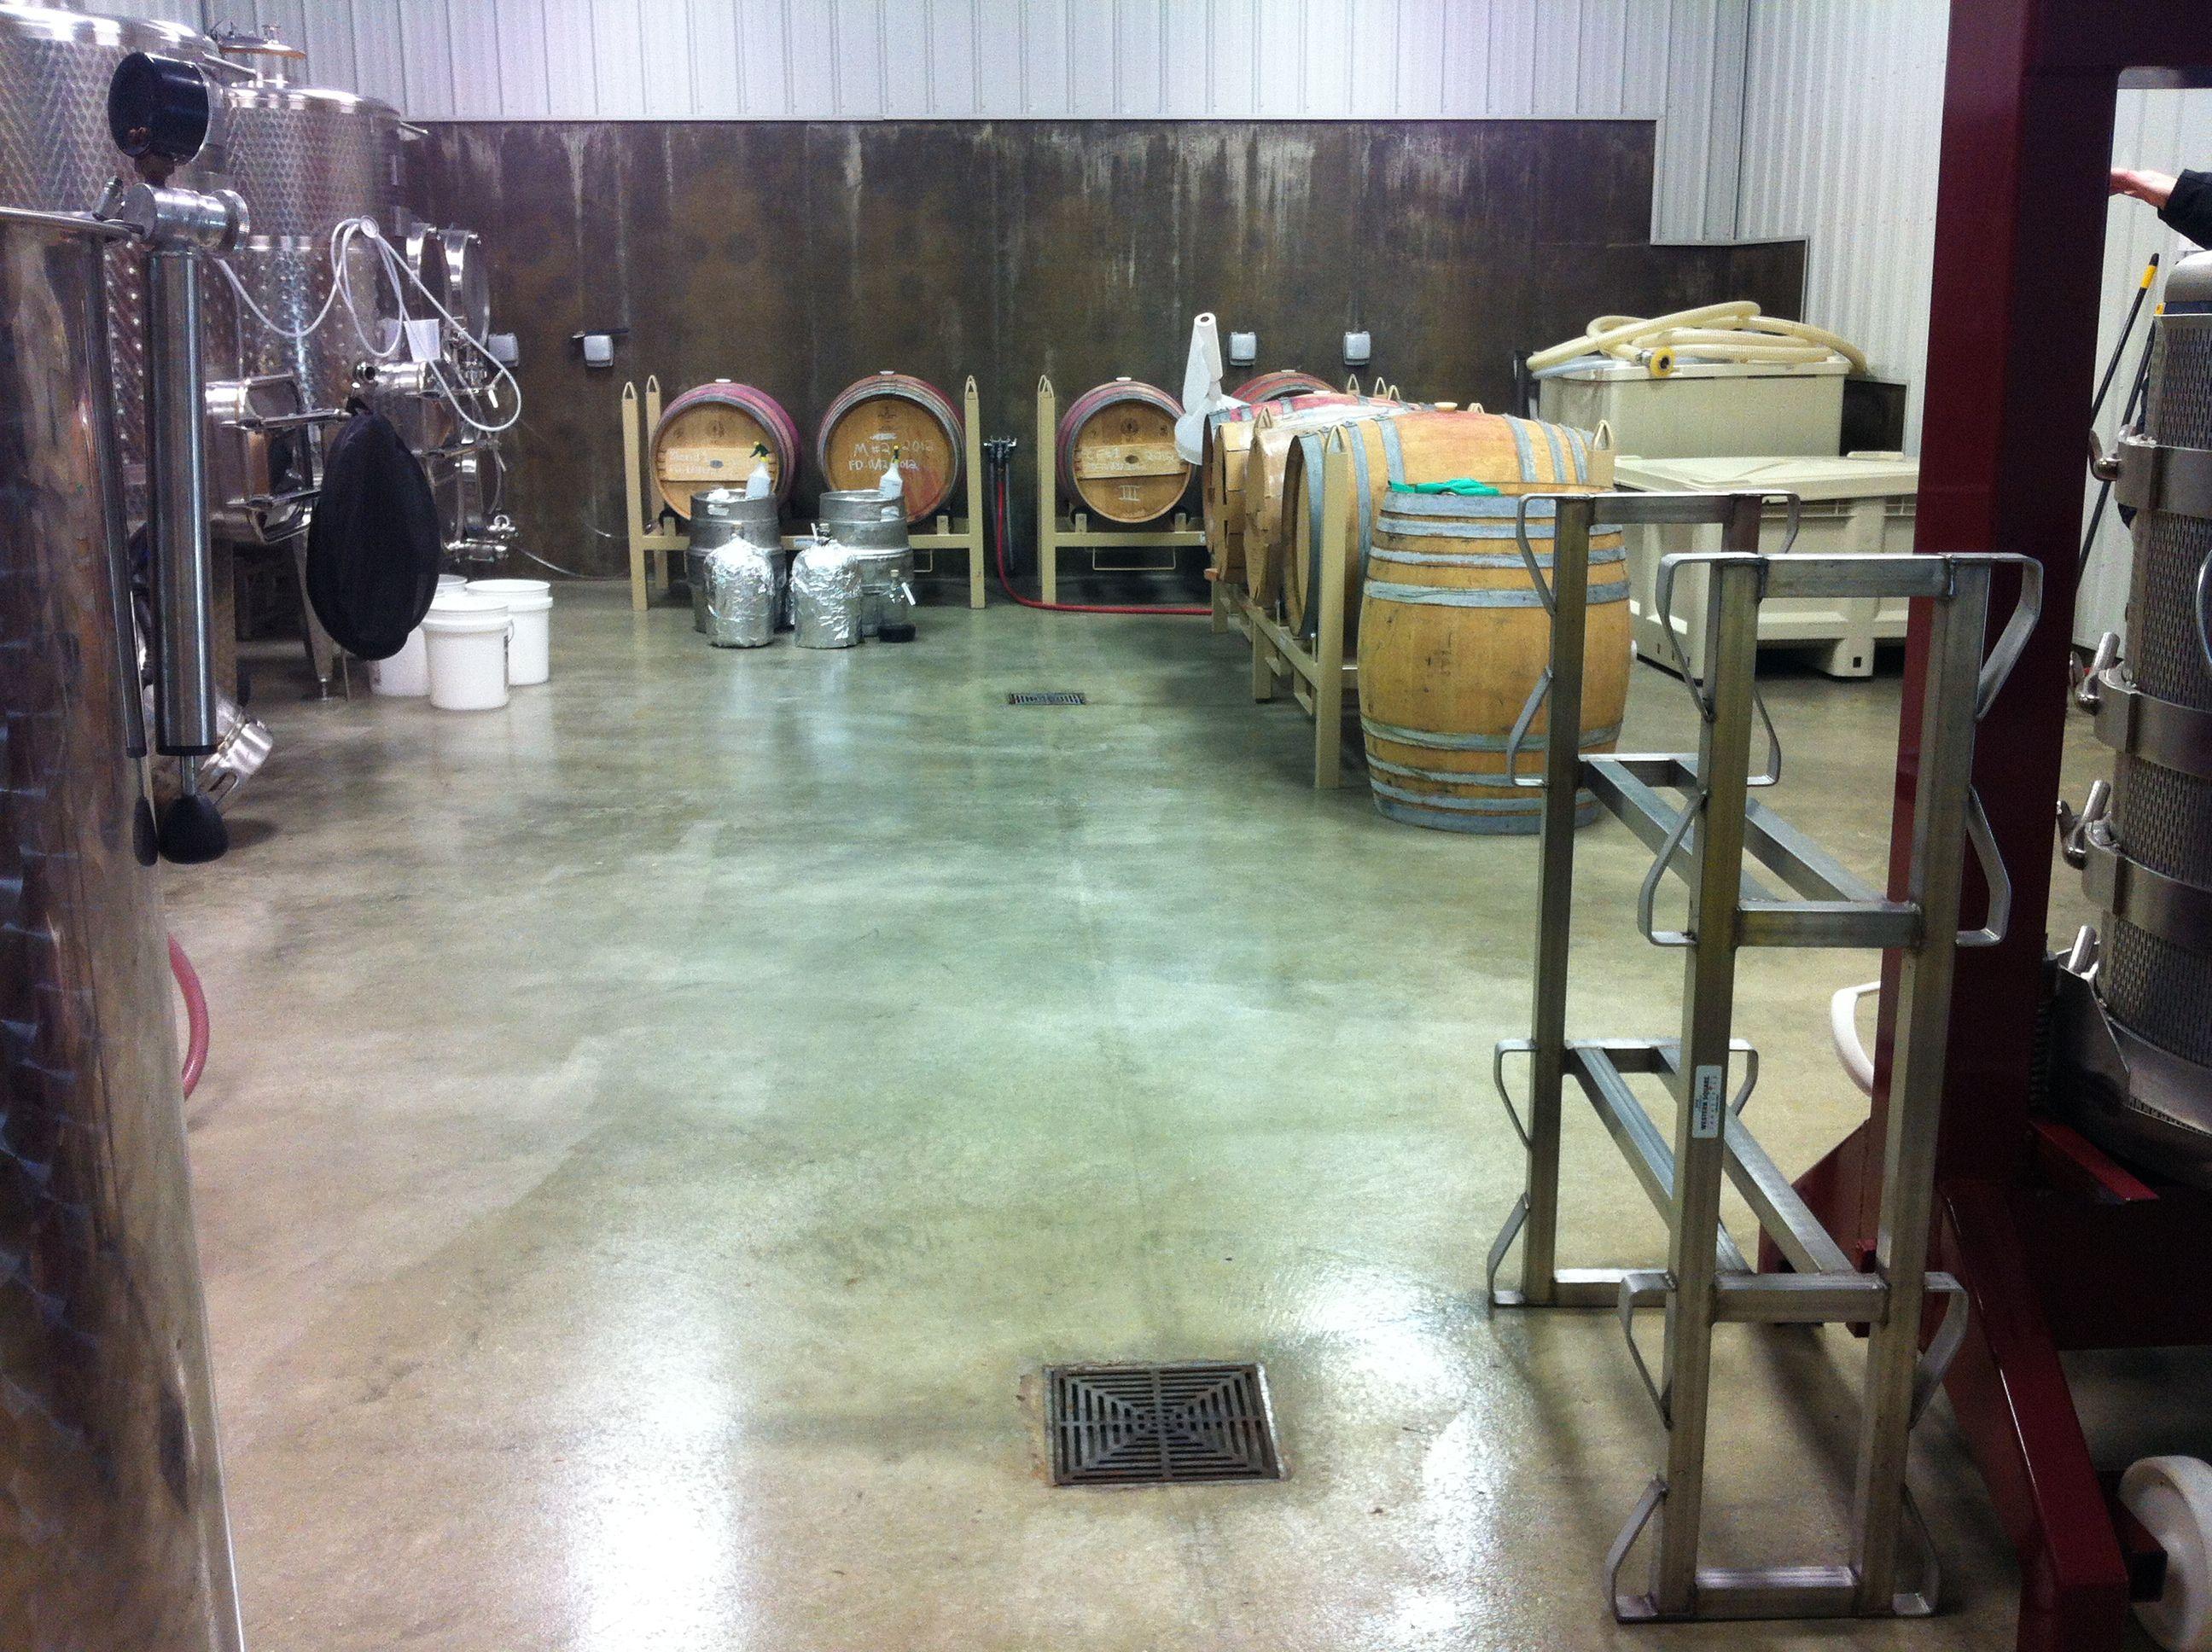 An Industrial Grade Clear Epoxy Sealer Over A Bare Concrete Floor In Local Winepress Concrete Floors Commercial Flooring Epoxy Sealer